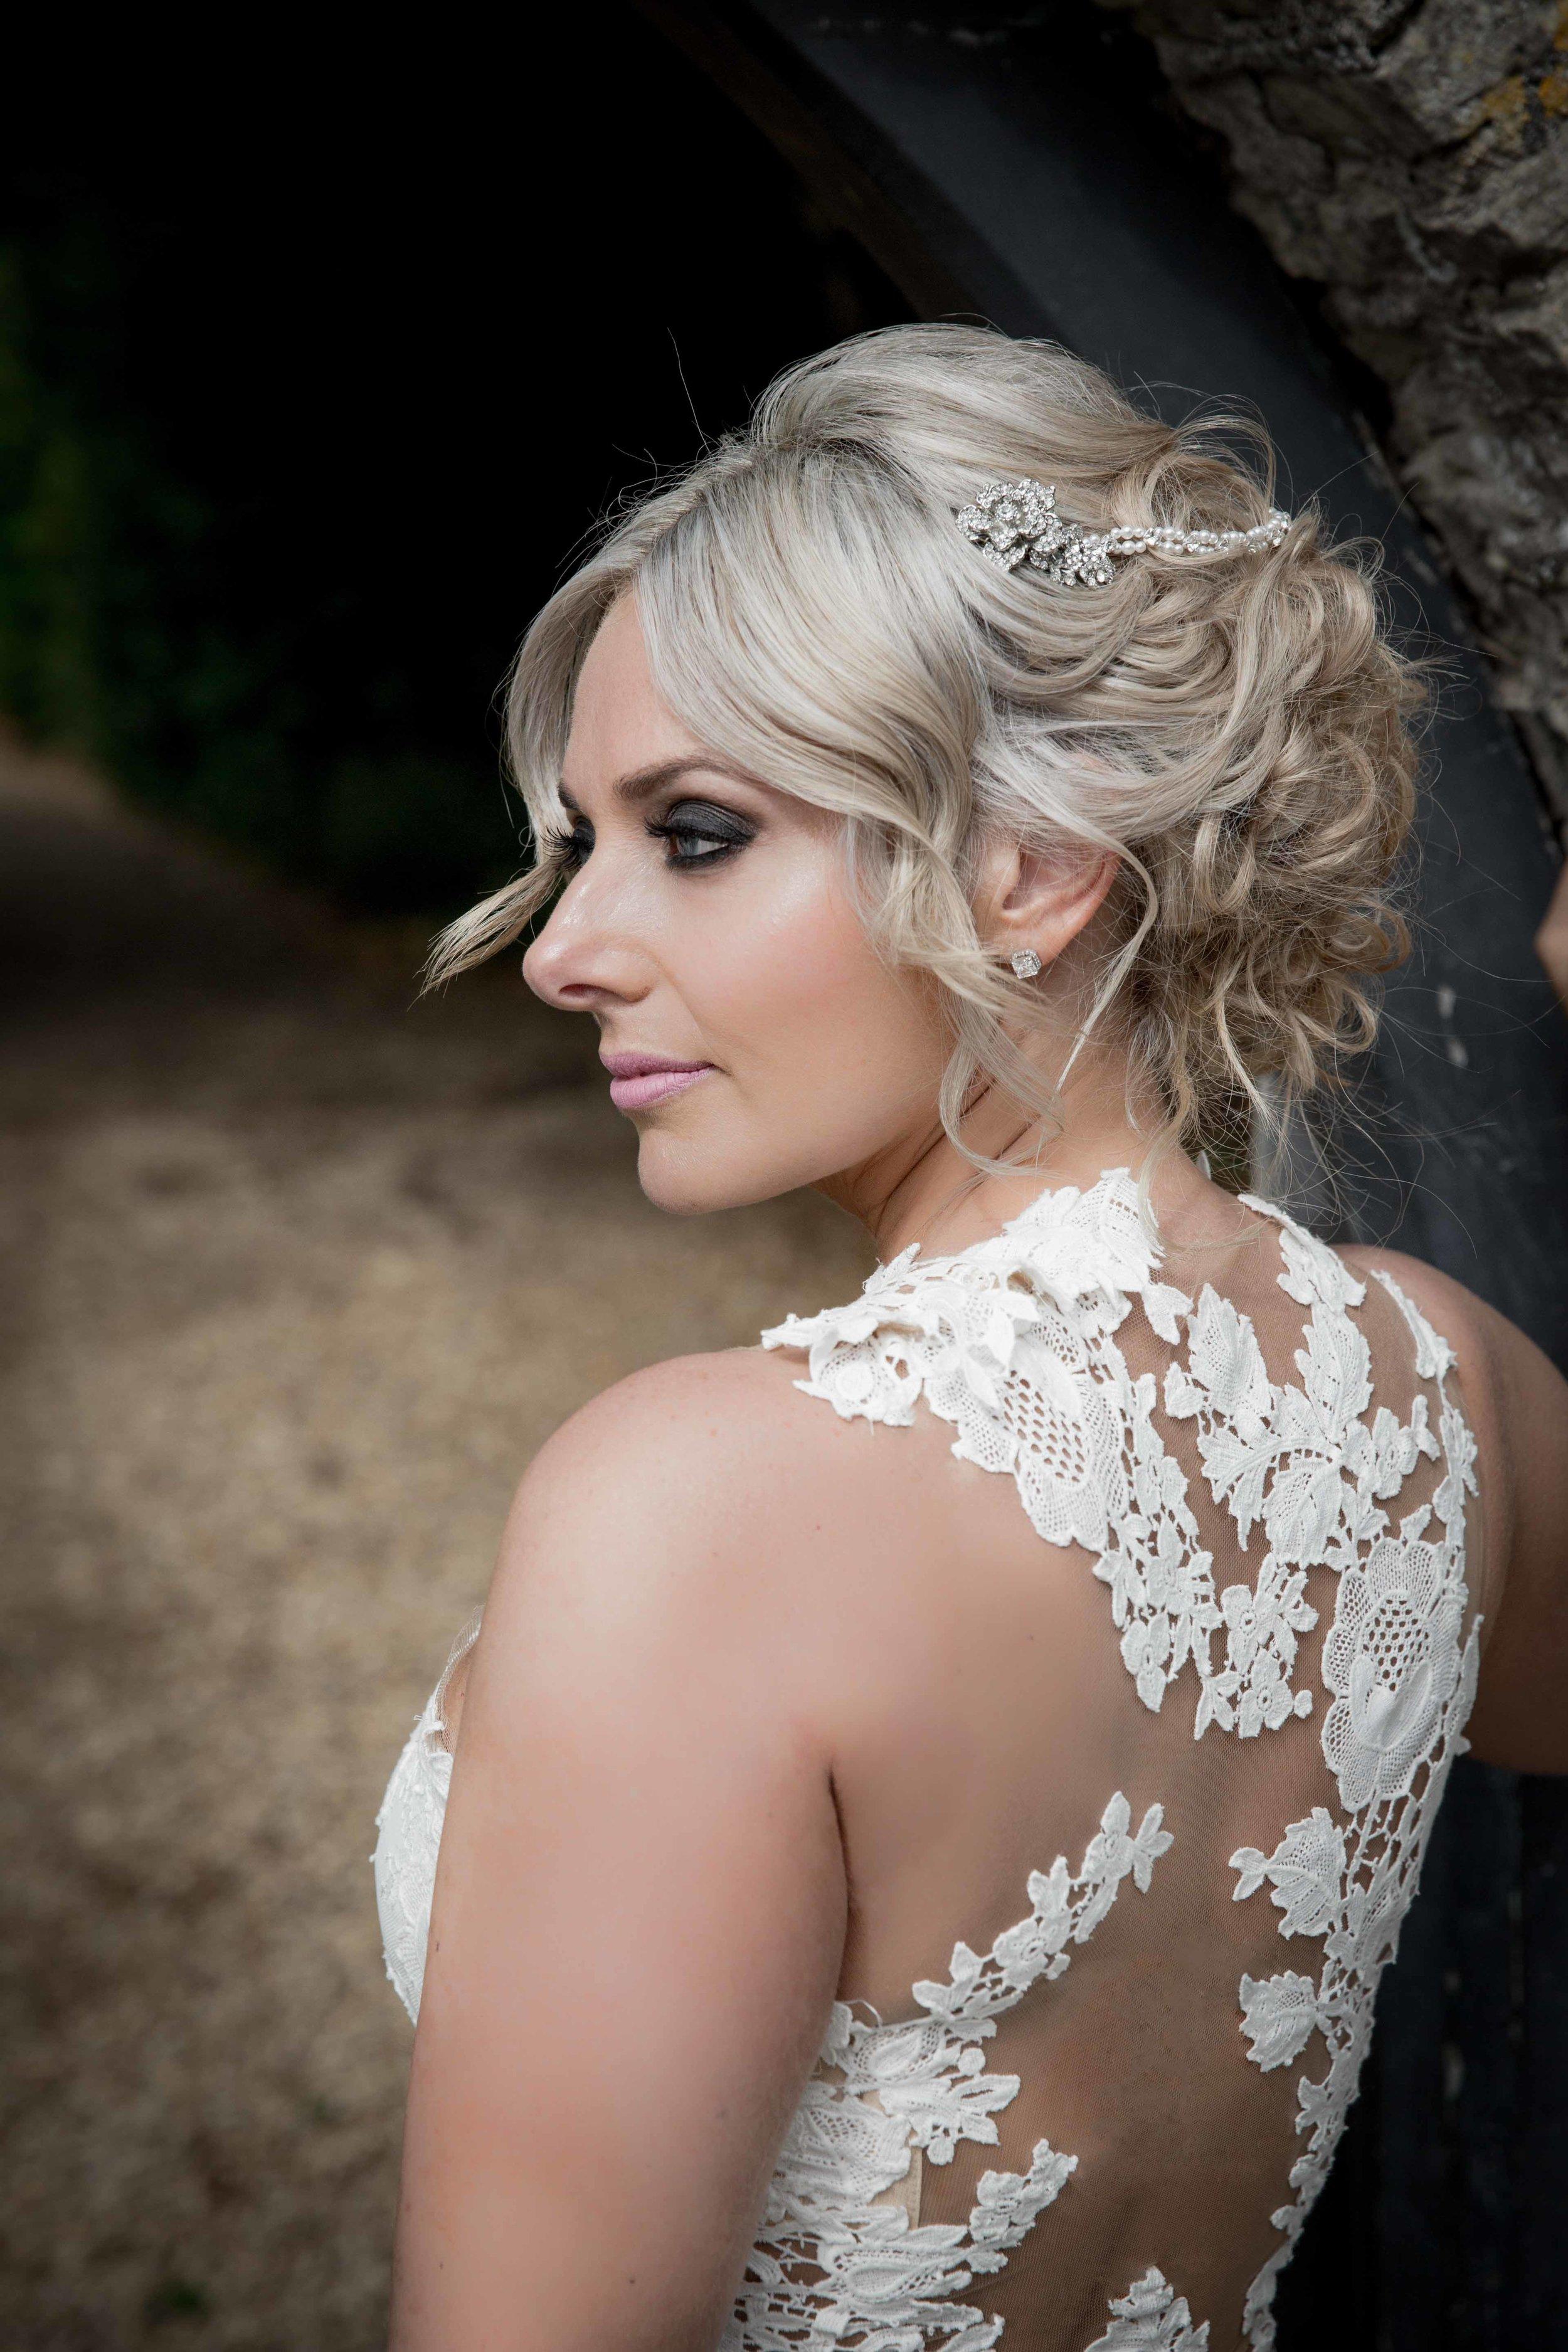 cotswold-wedding-photography-at-stonehouse-court-hotel-natalia-smith-photography-gloucestershire-wedding-photographer-66.jpg